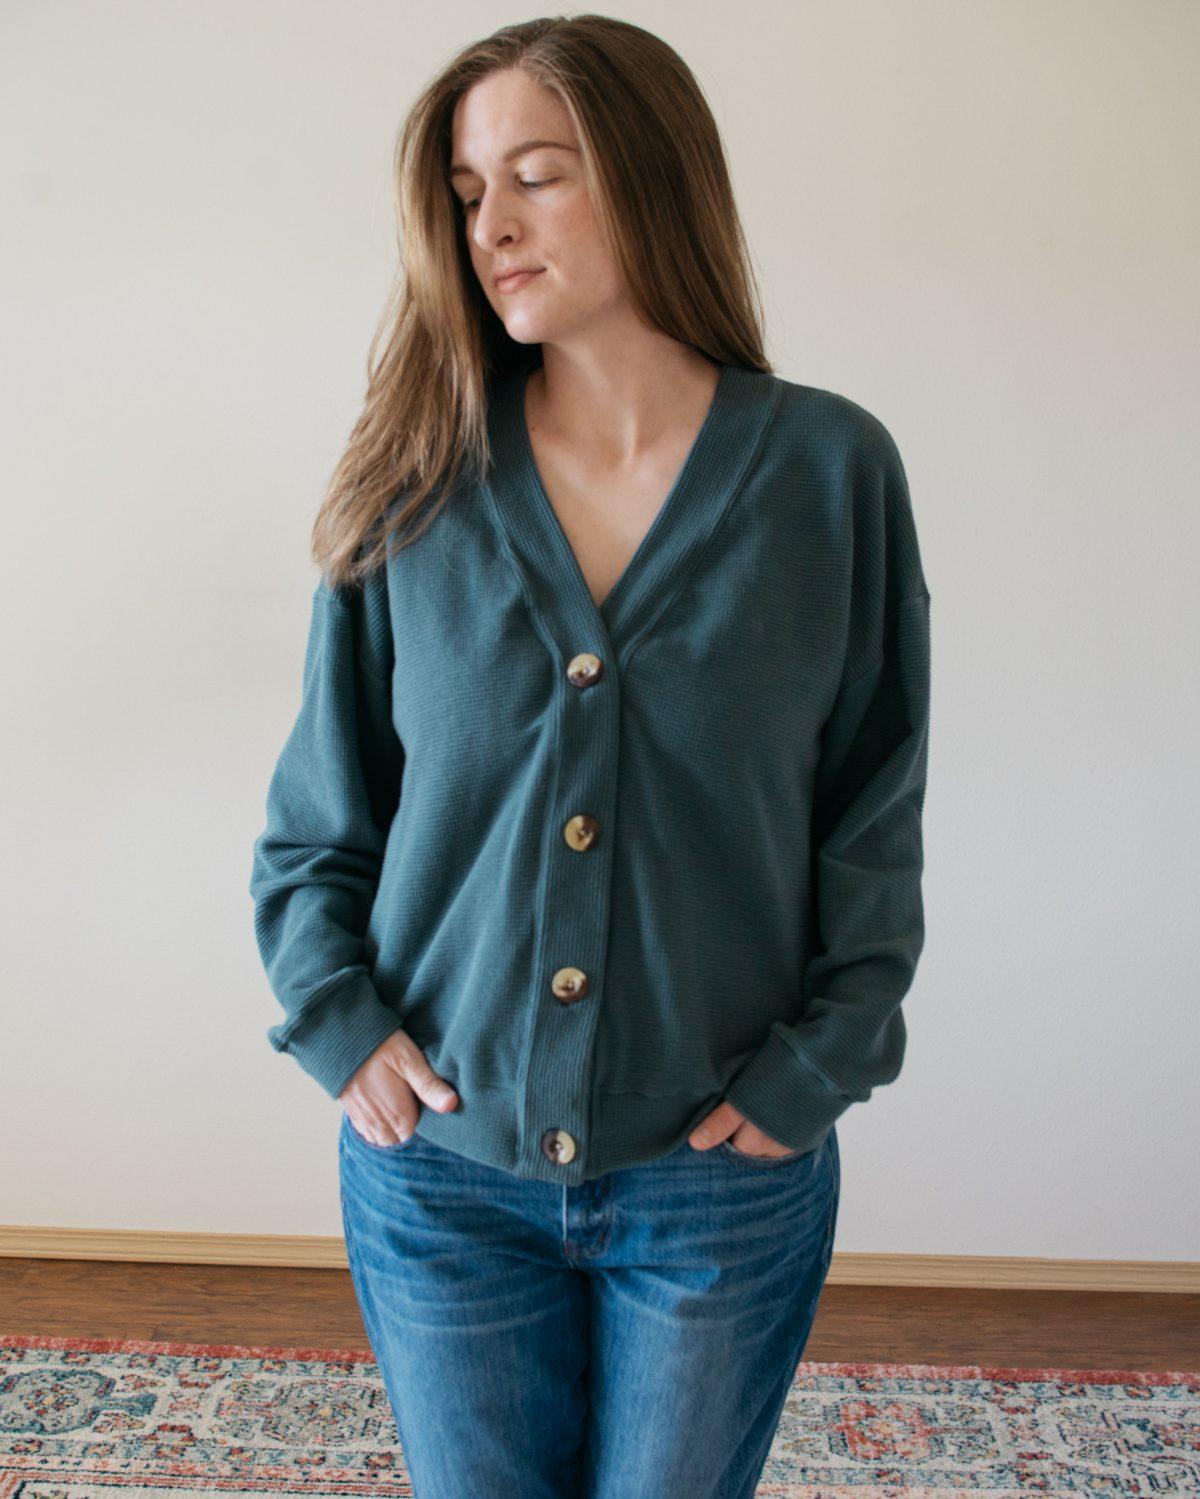 Marlo Sweater – Two Ways